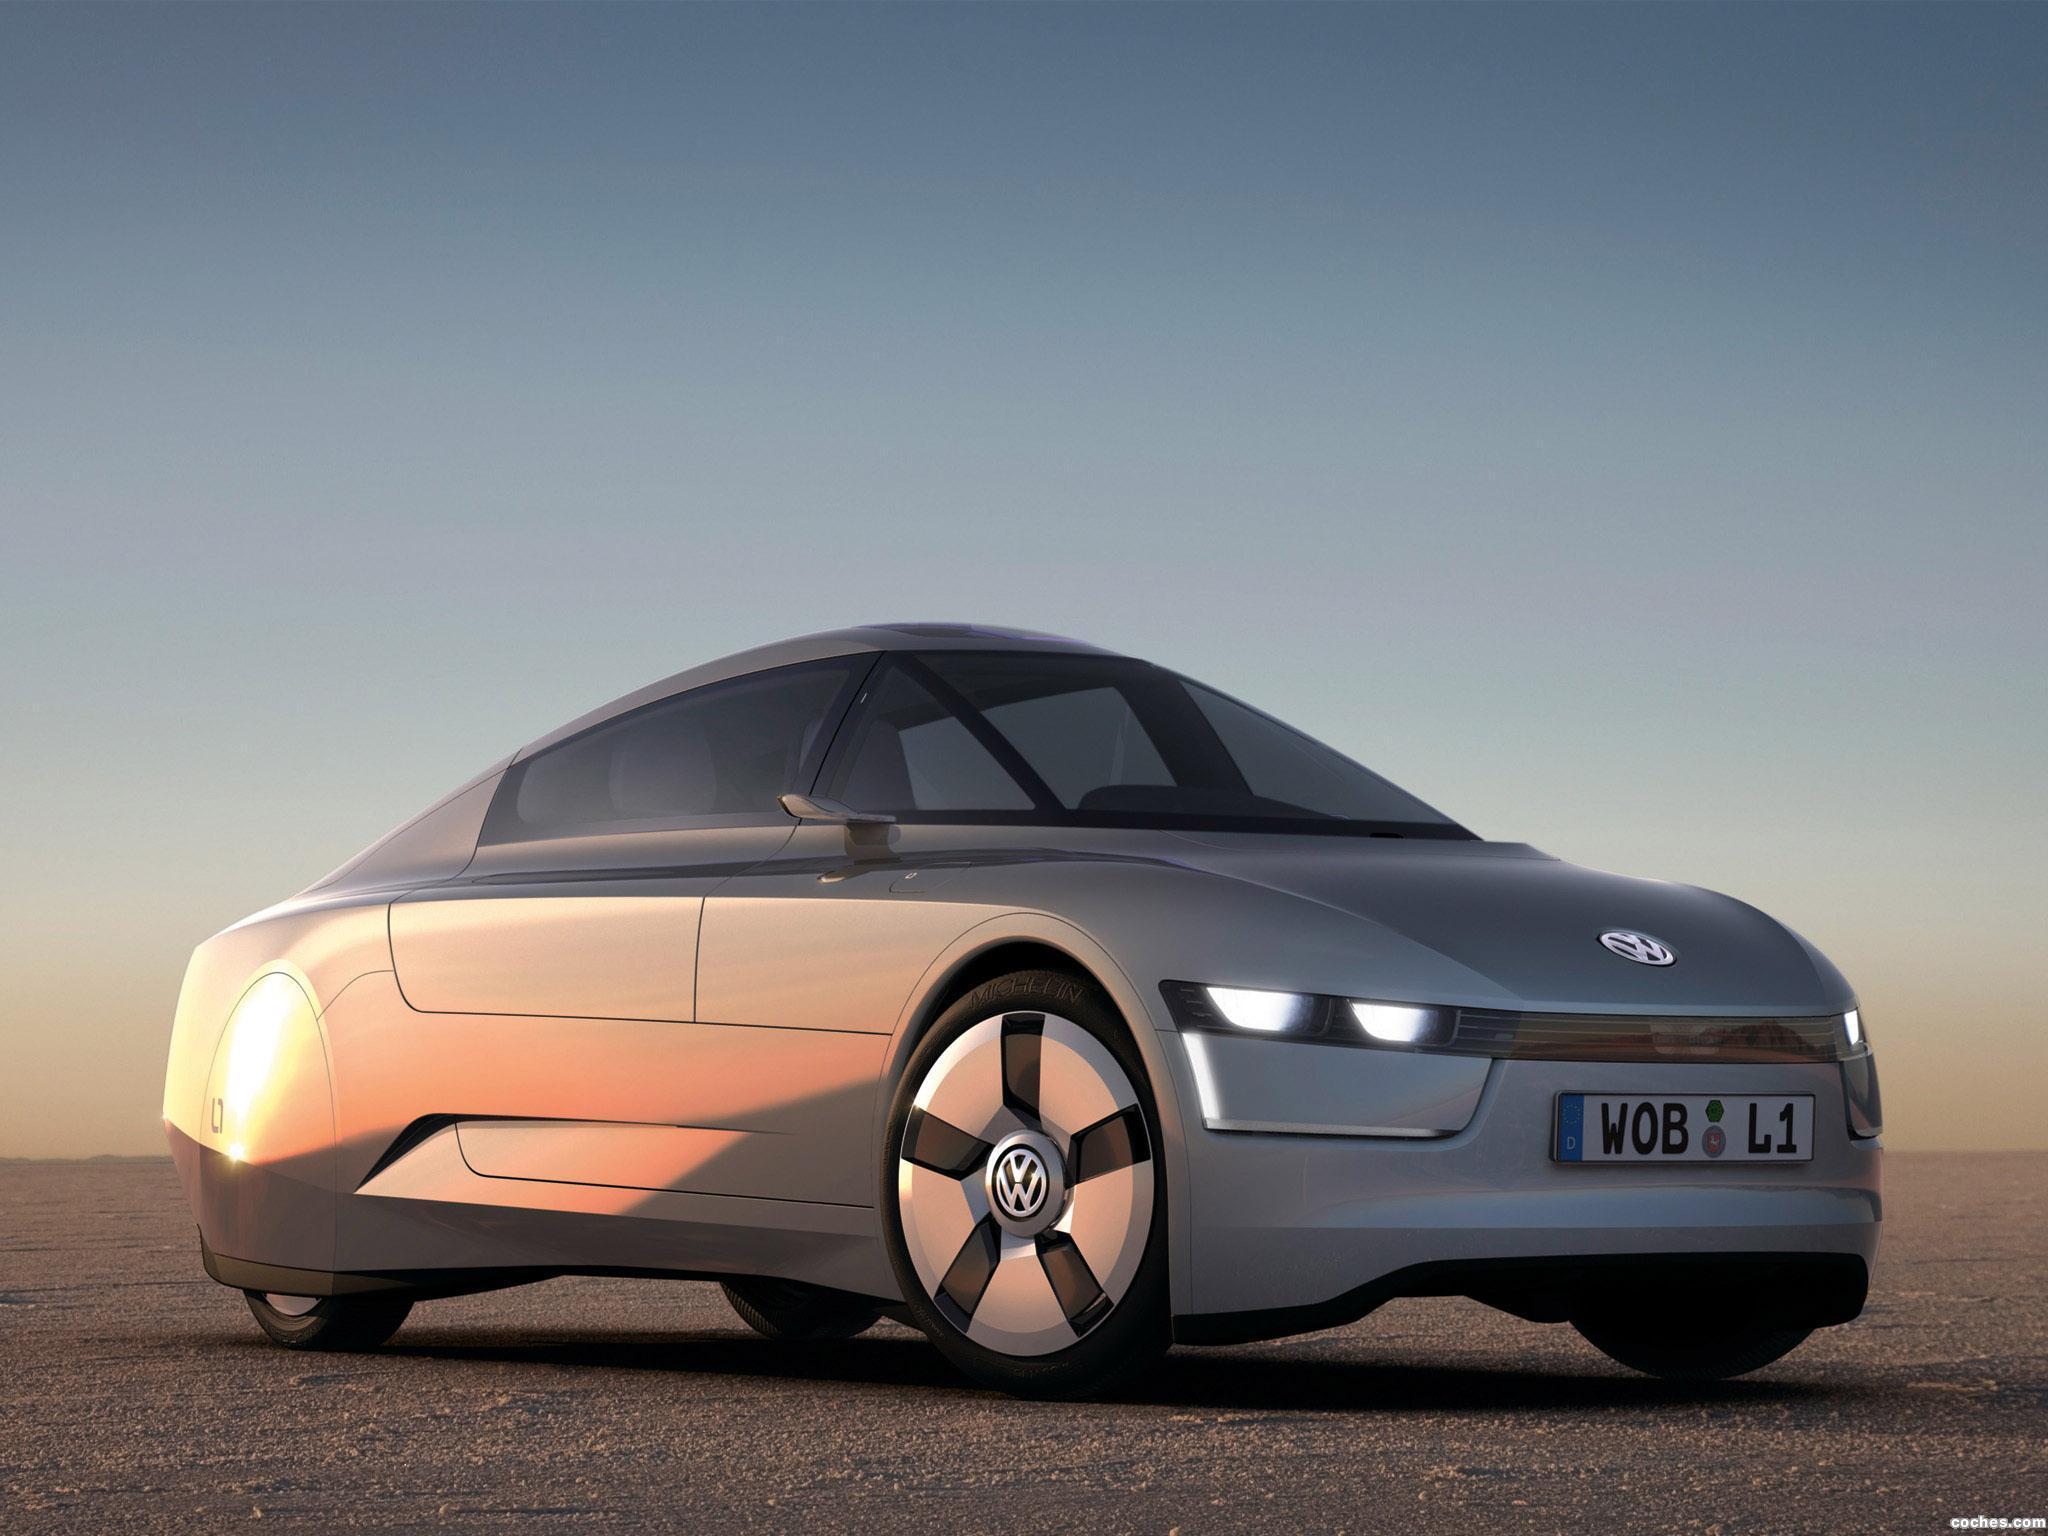 Foto 0 de Volkswagen L1 Concept 2009